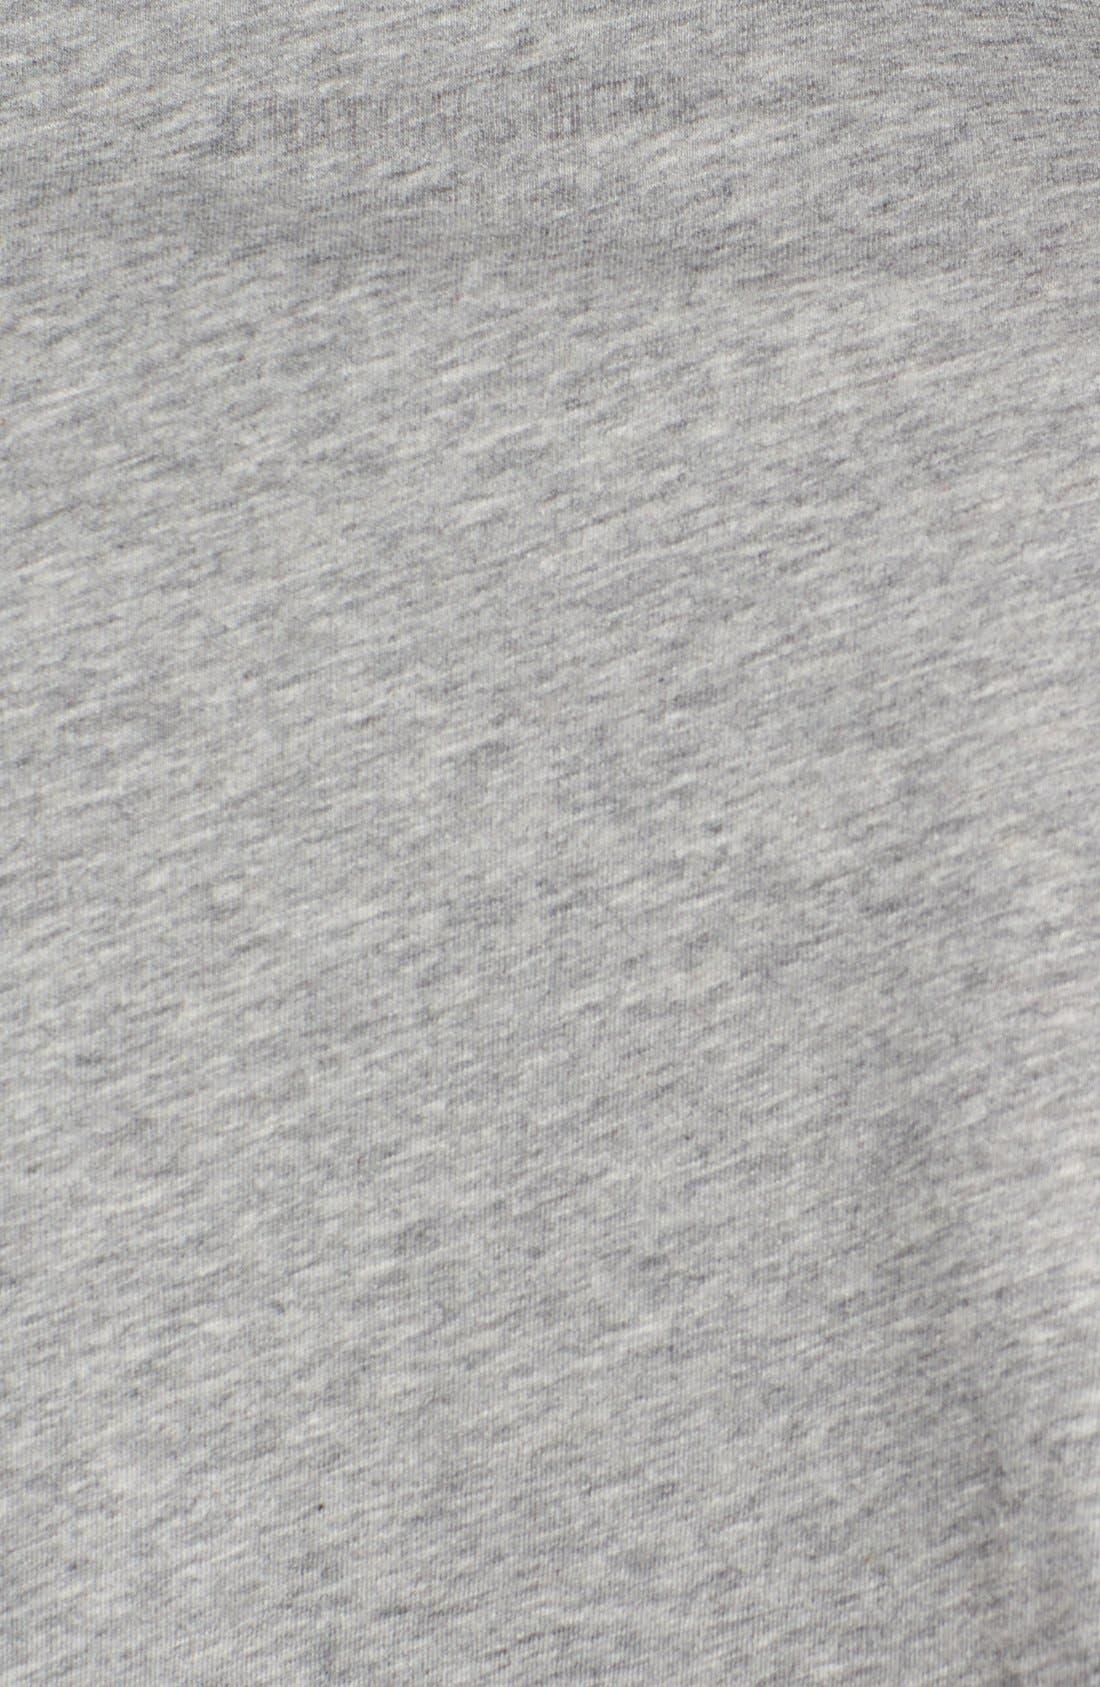 Alternate Image 3  - Zadig & Voltaire 'Skull' V-Neck T-Shirt